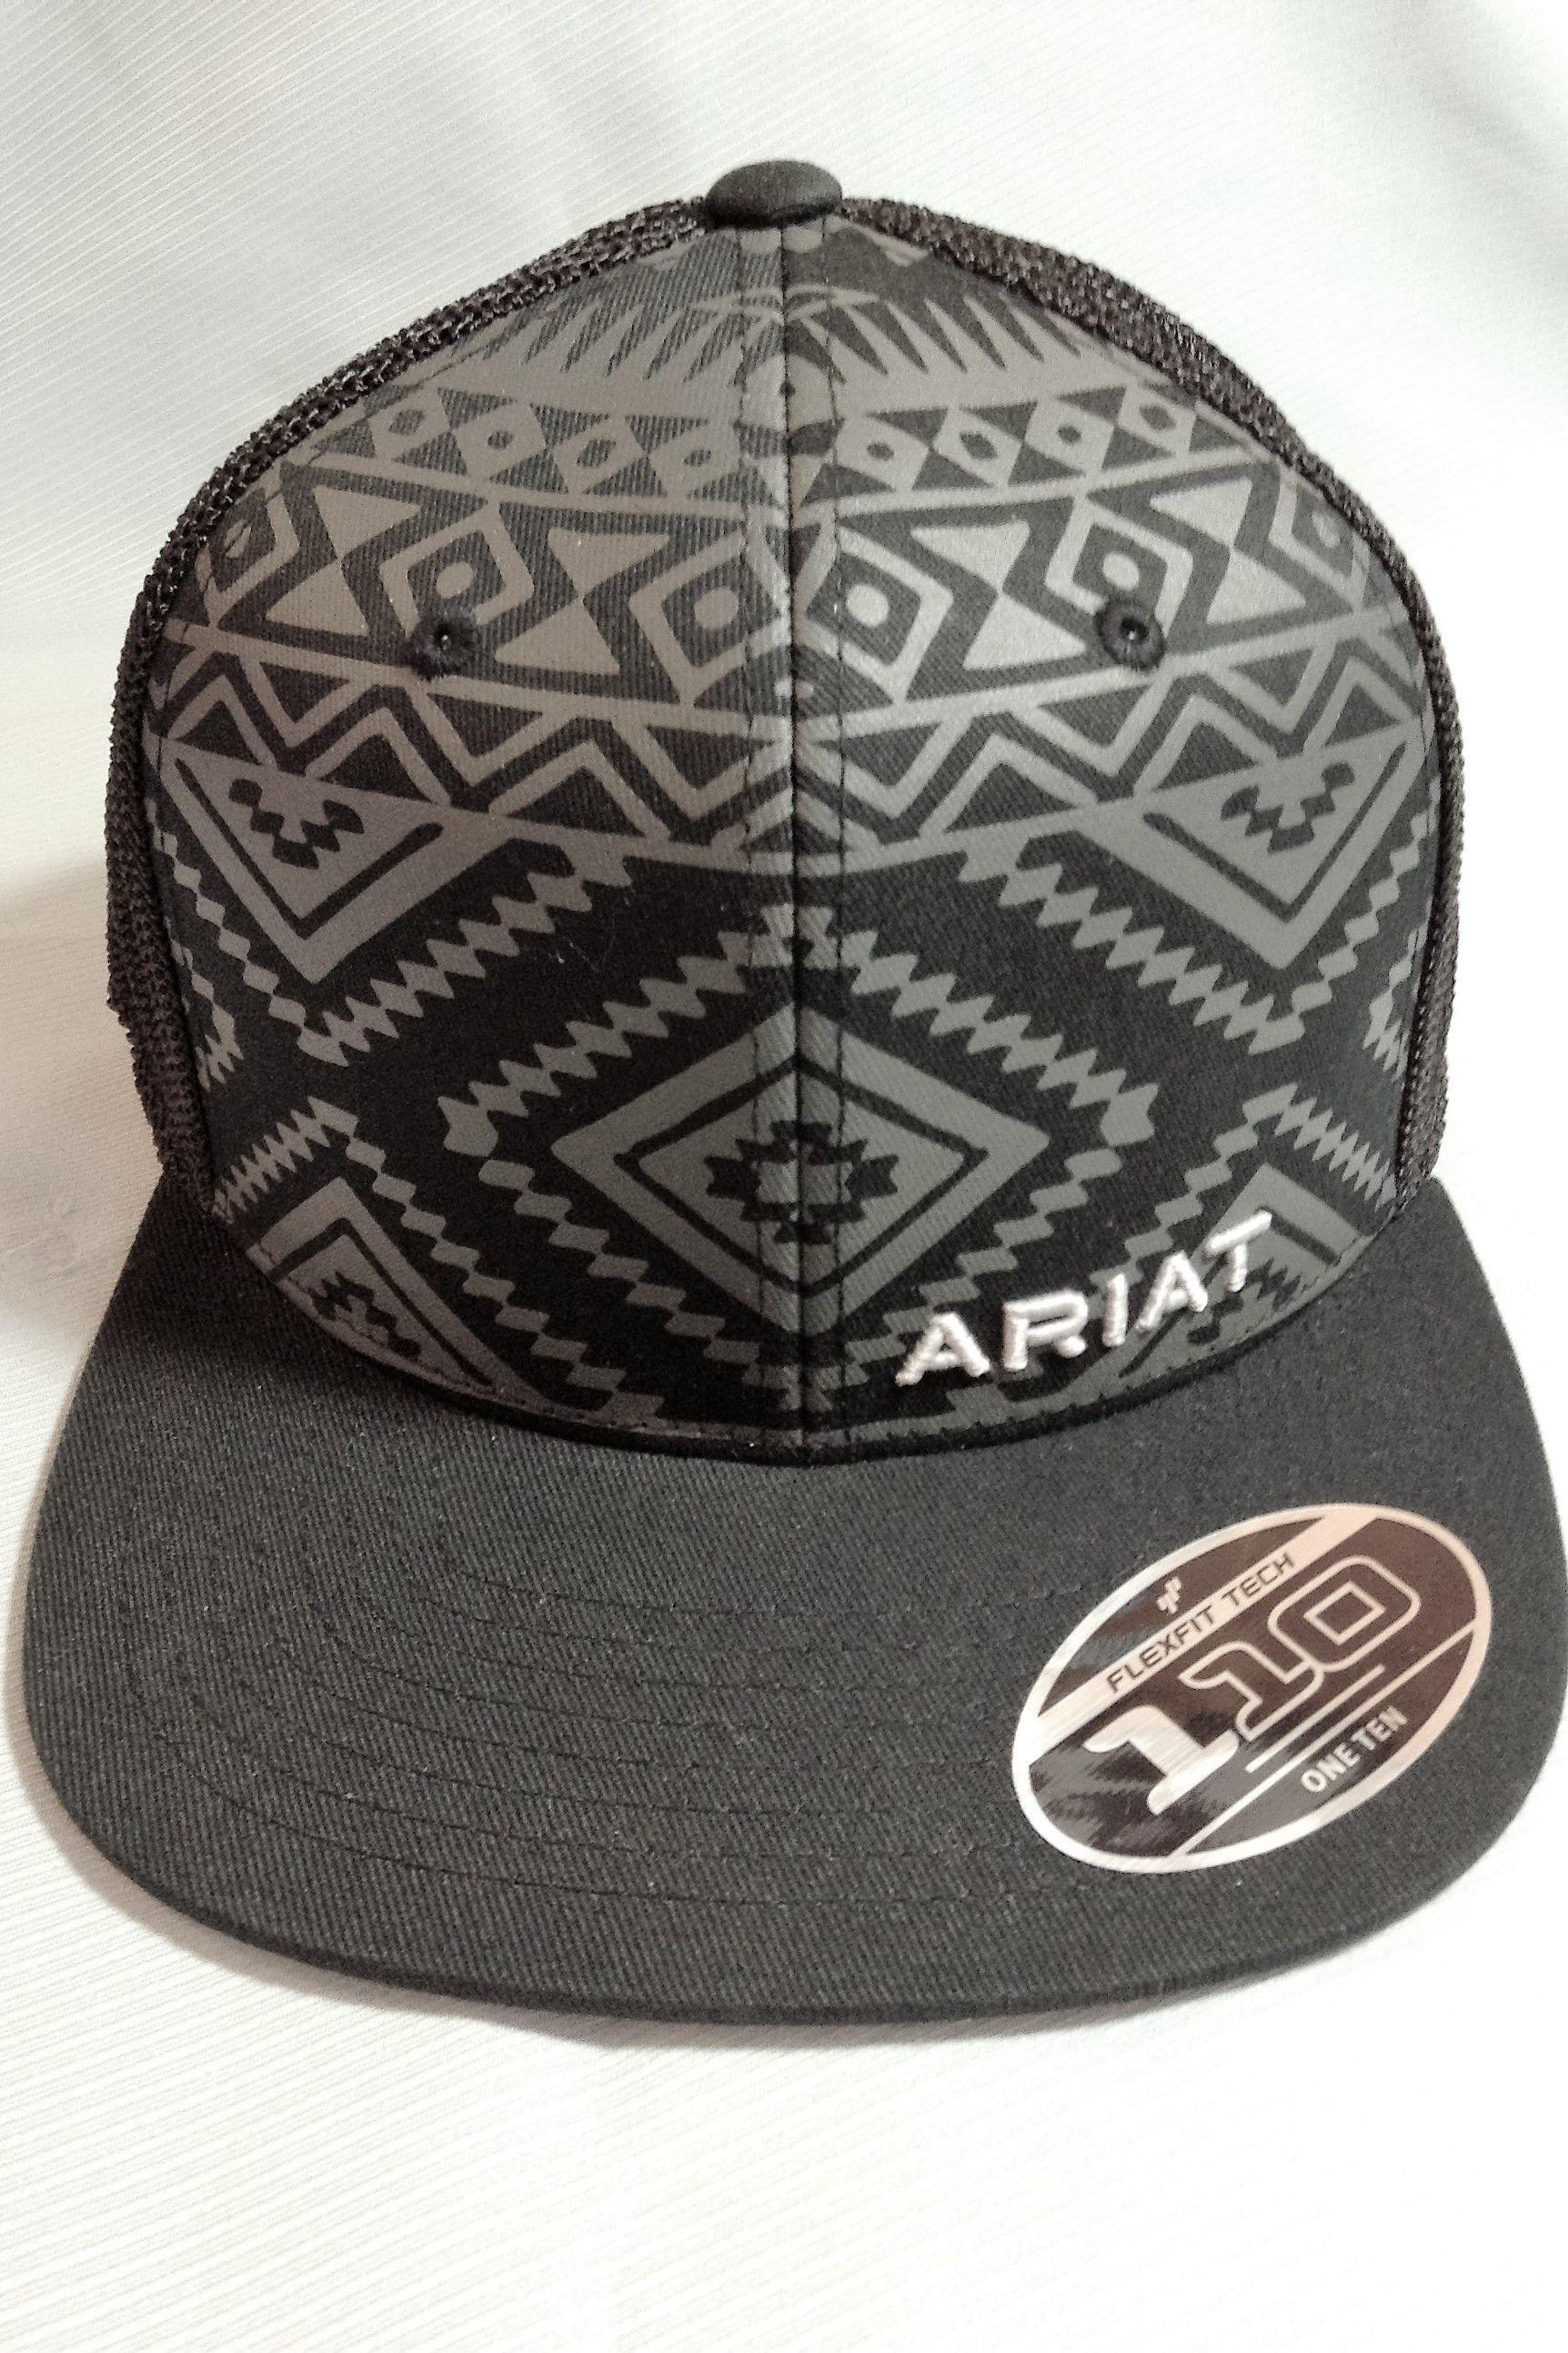 048e2c6f5cbb6 Men s Tribal Ariat Hat